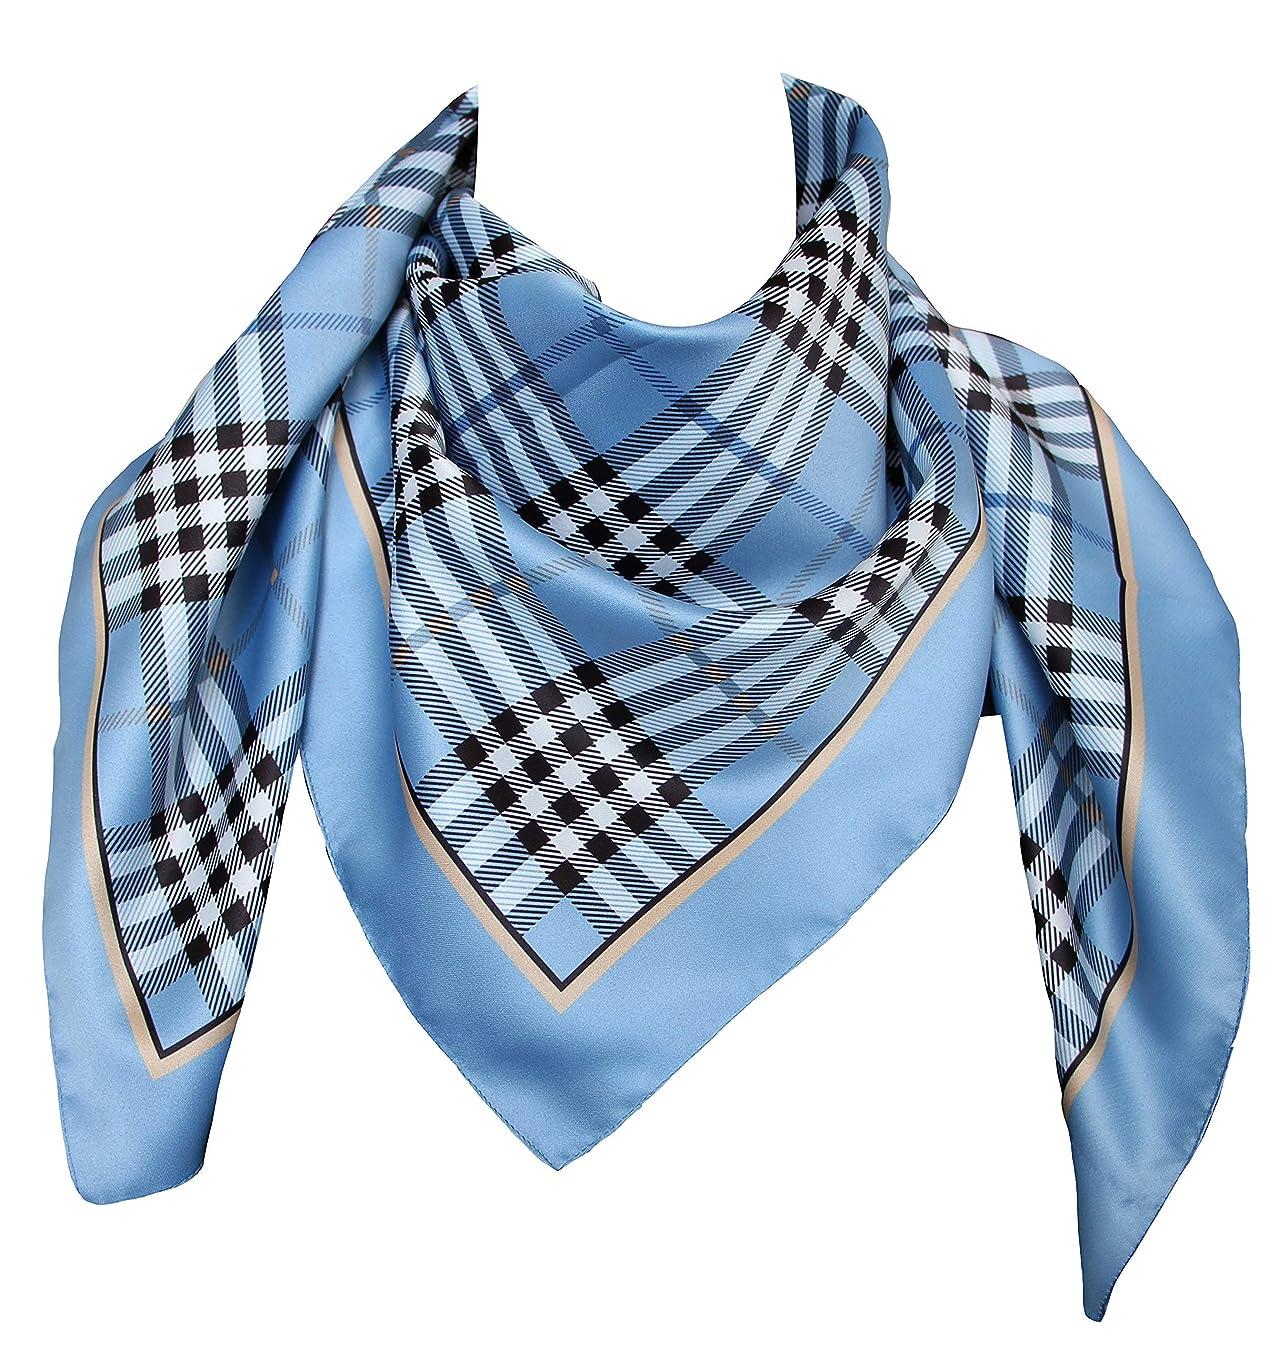 foulard dis 62689 var 2 size inch 36 x 36